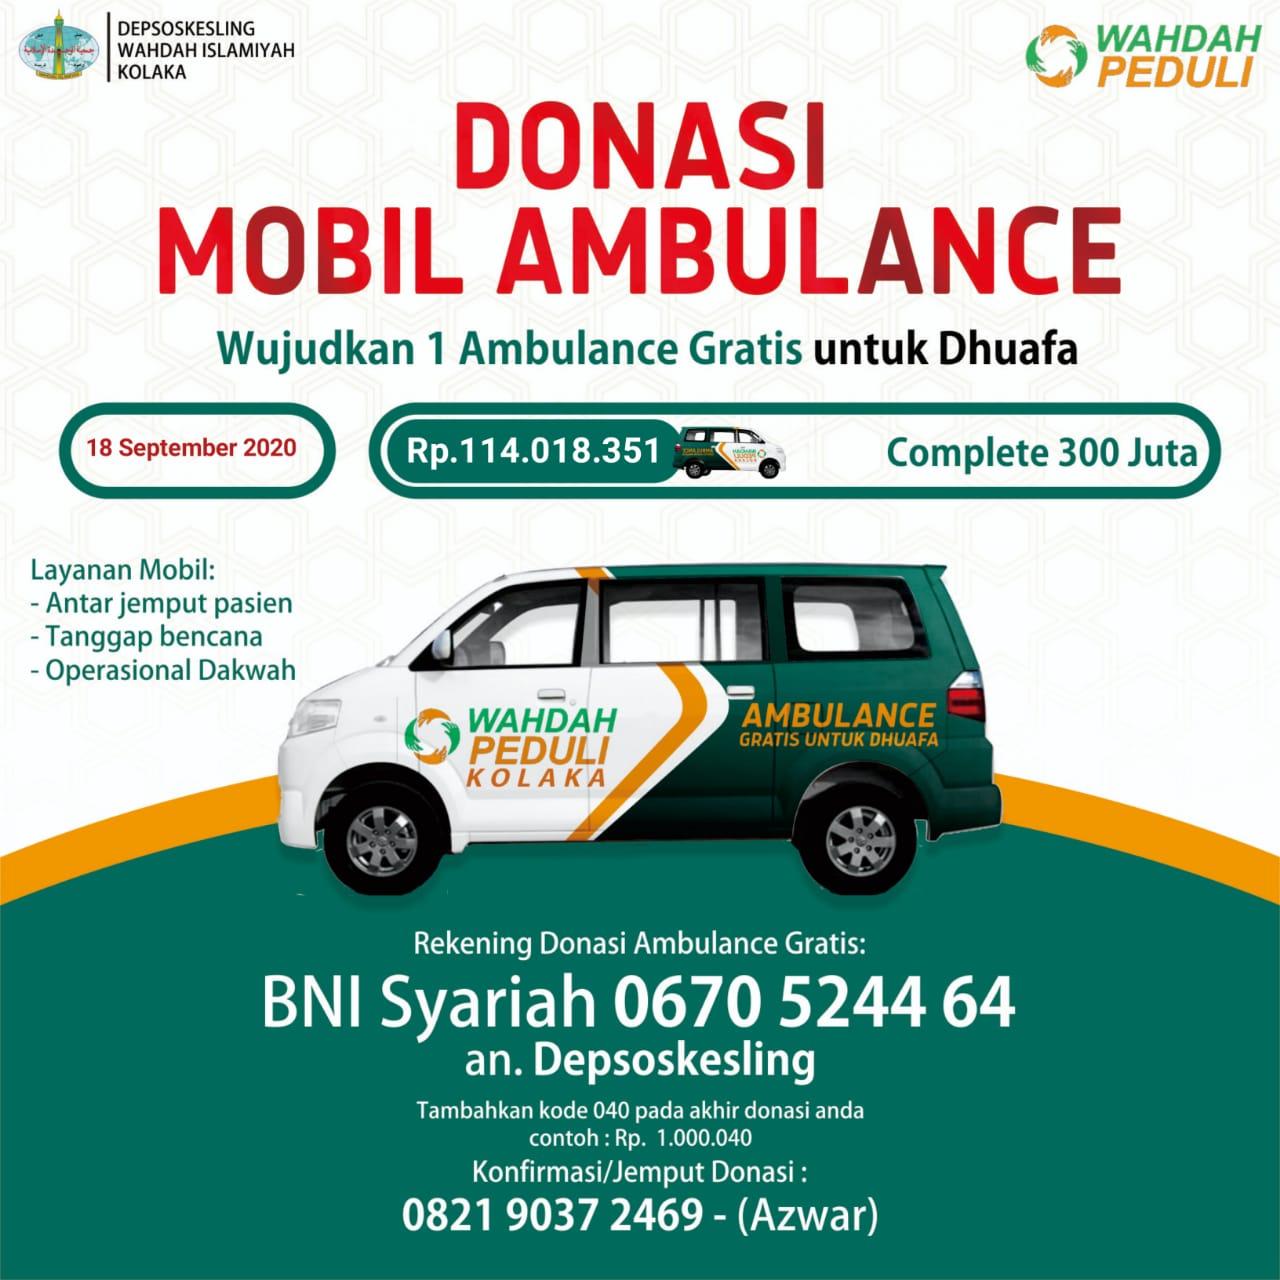 Donasi Ambulance